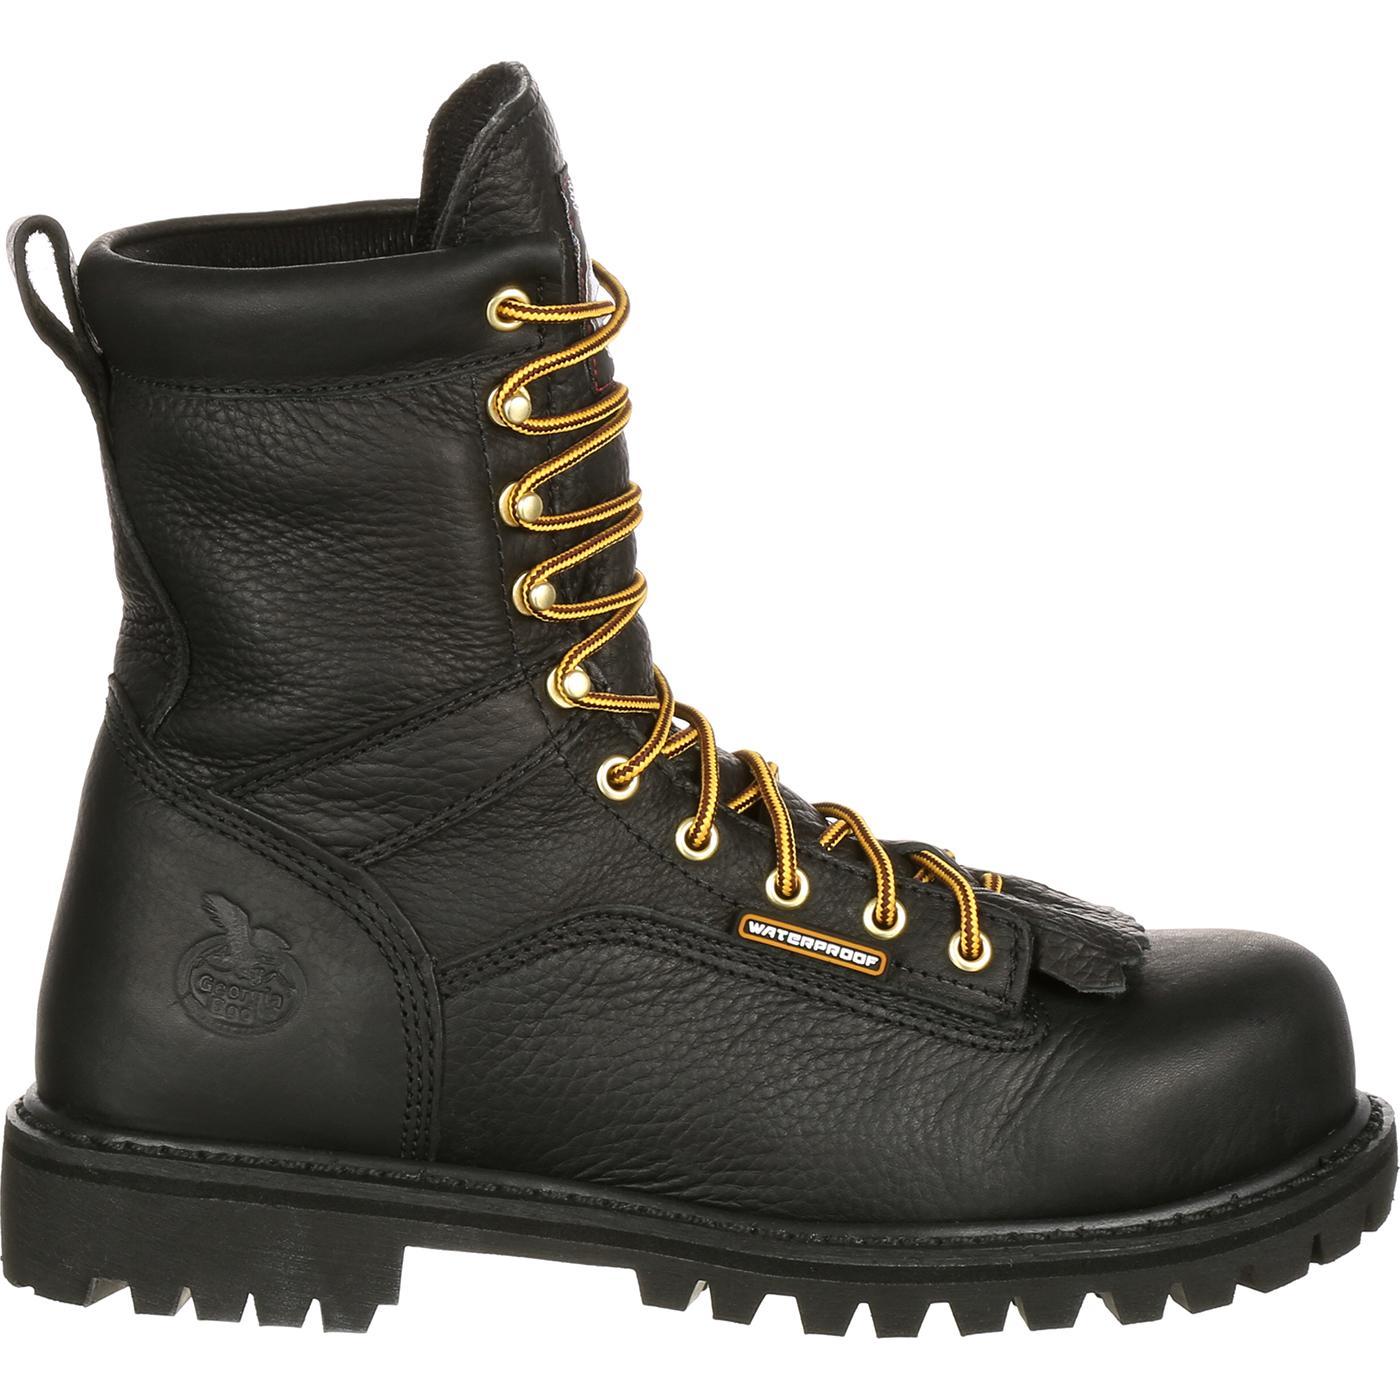 eec2e431fb8 Georgia Boot Waterproof Lace-to-Toe Work Boot